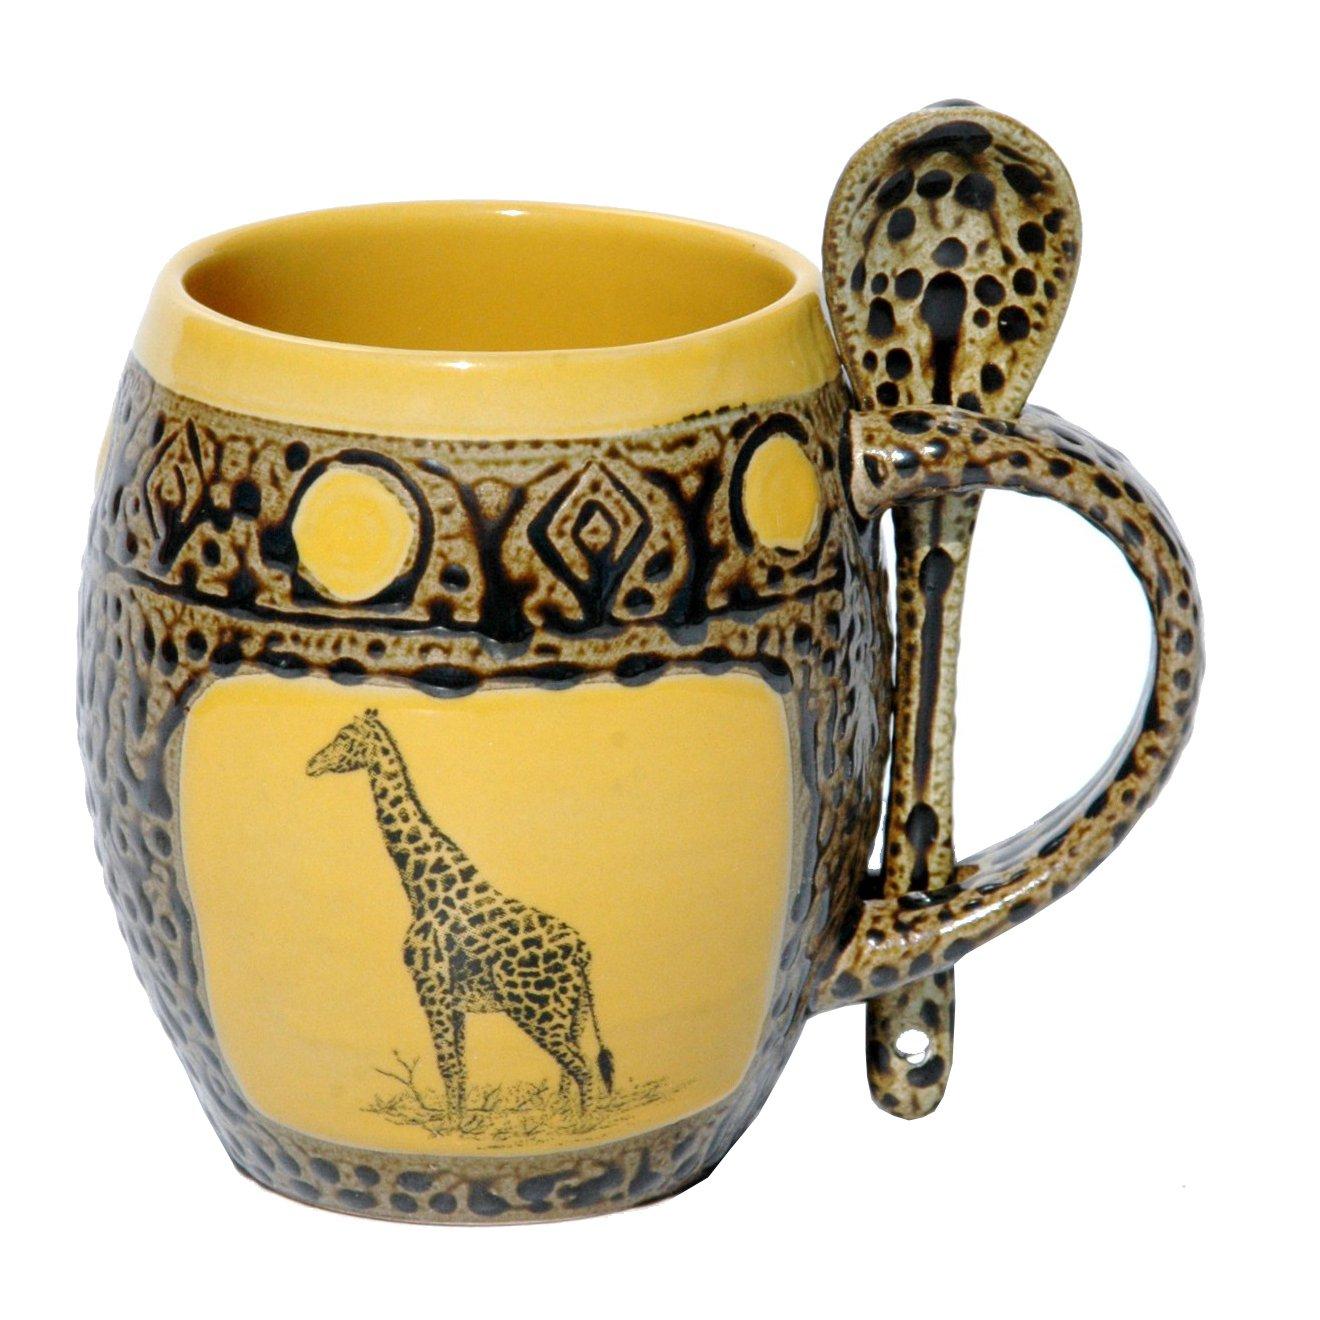 Giraffe Mug with Spoon in Dark Yellow